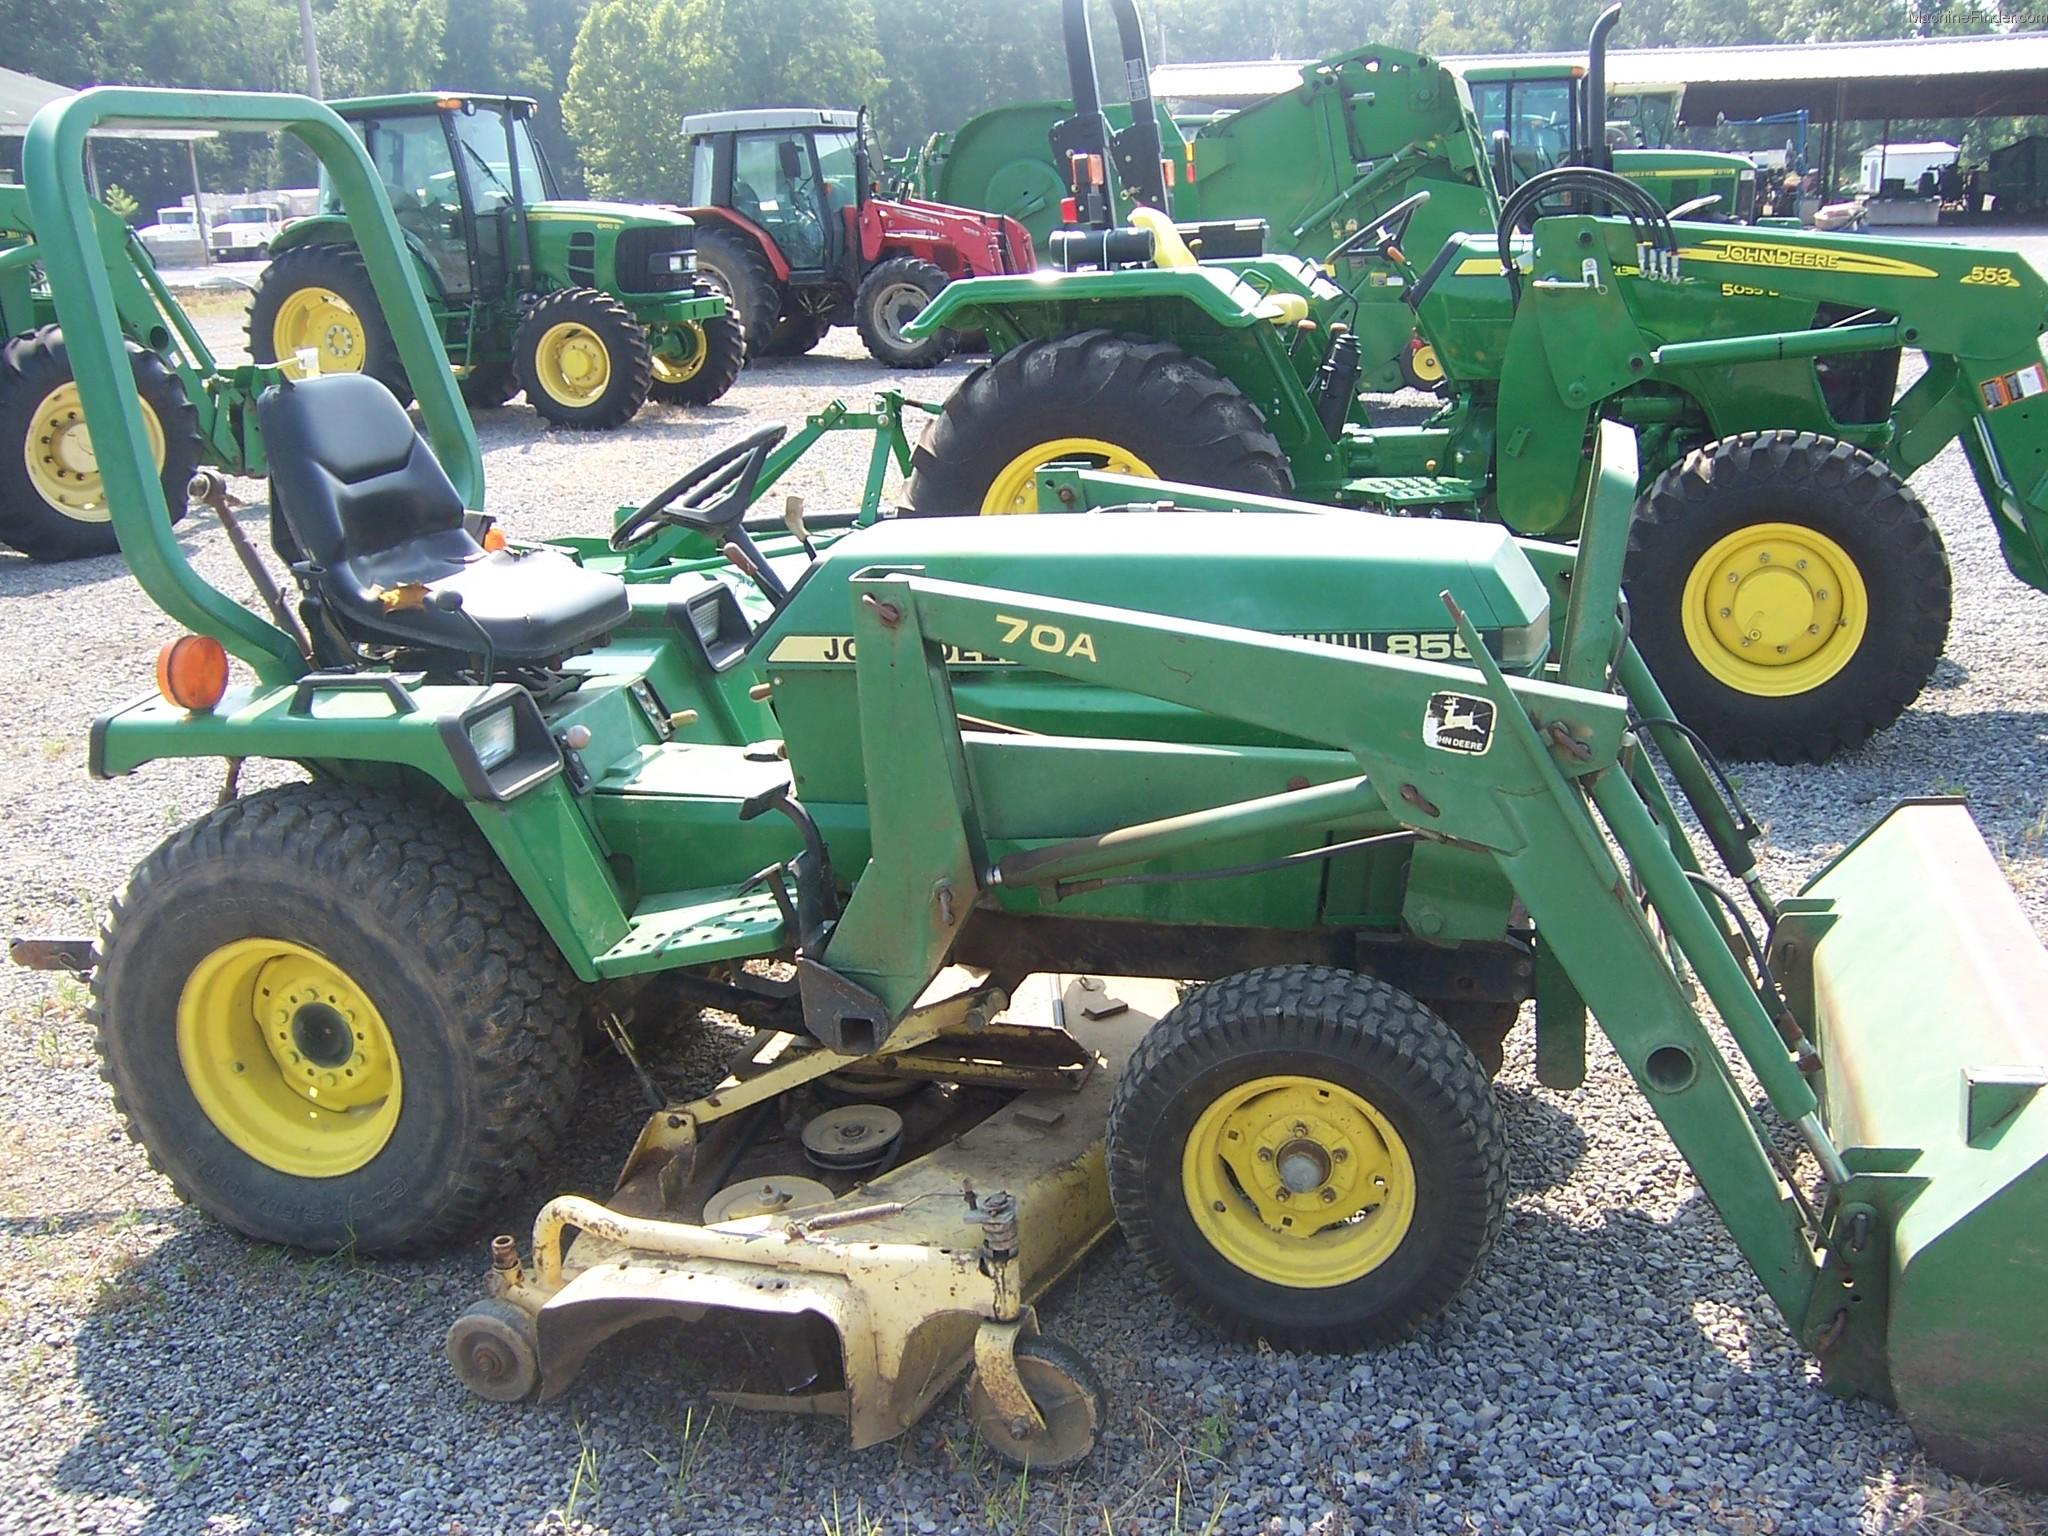 1991 John Deere 855 Tractors - Compact (1-40hp.) - John ...